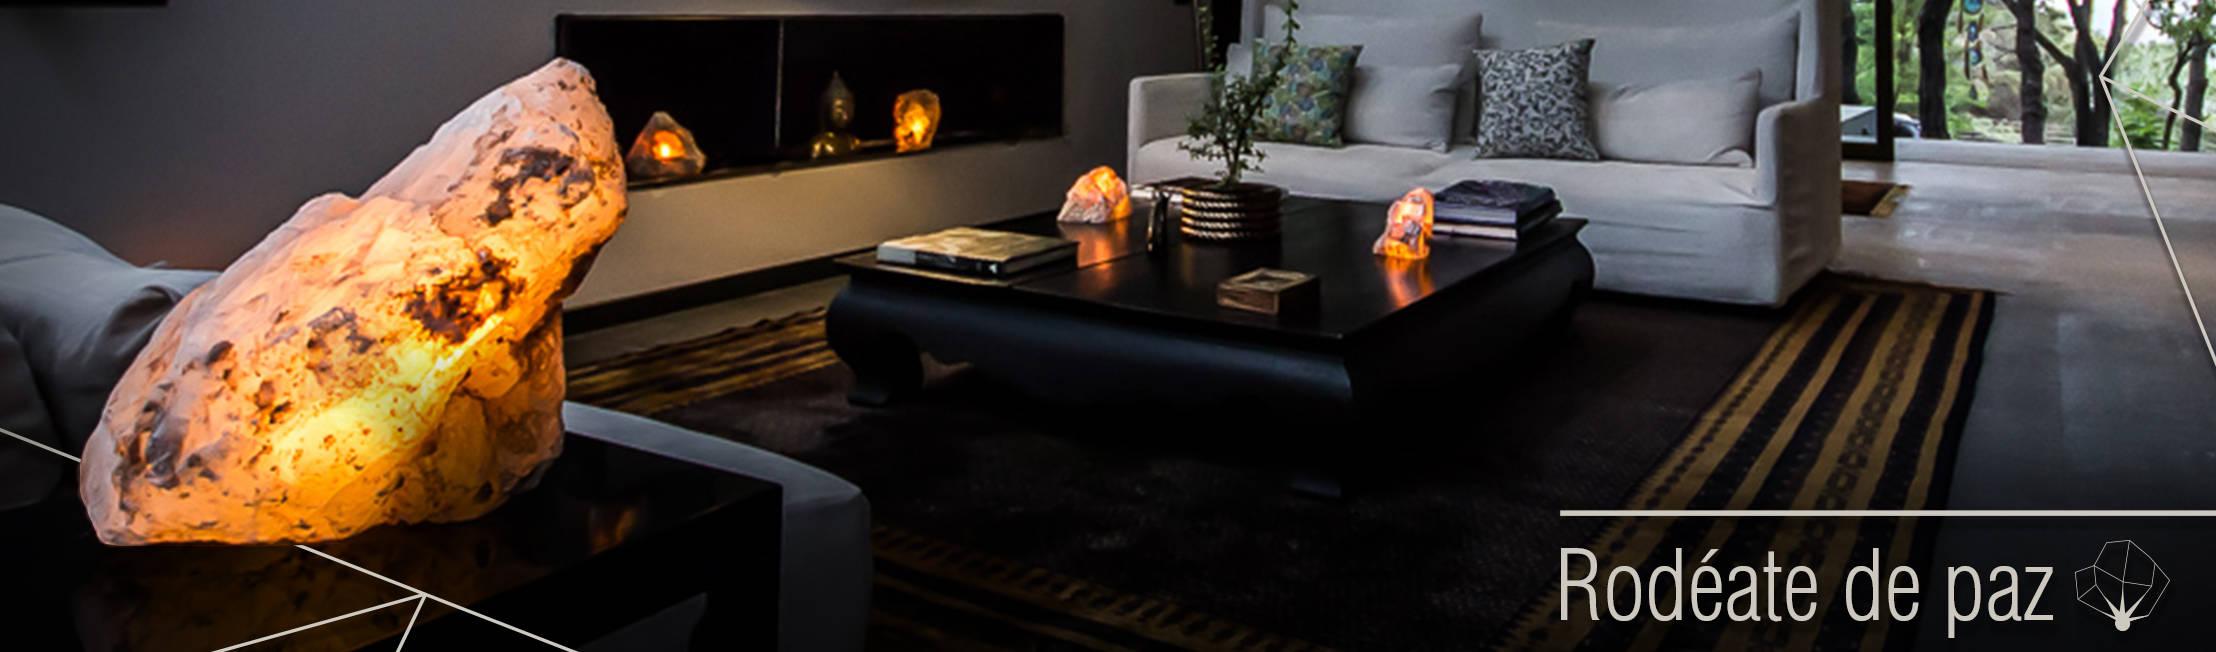 Selenium lámparas de cuarzo